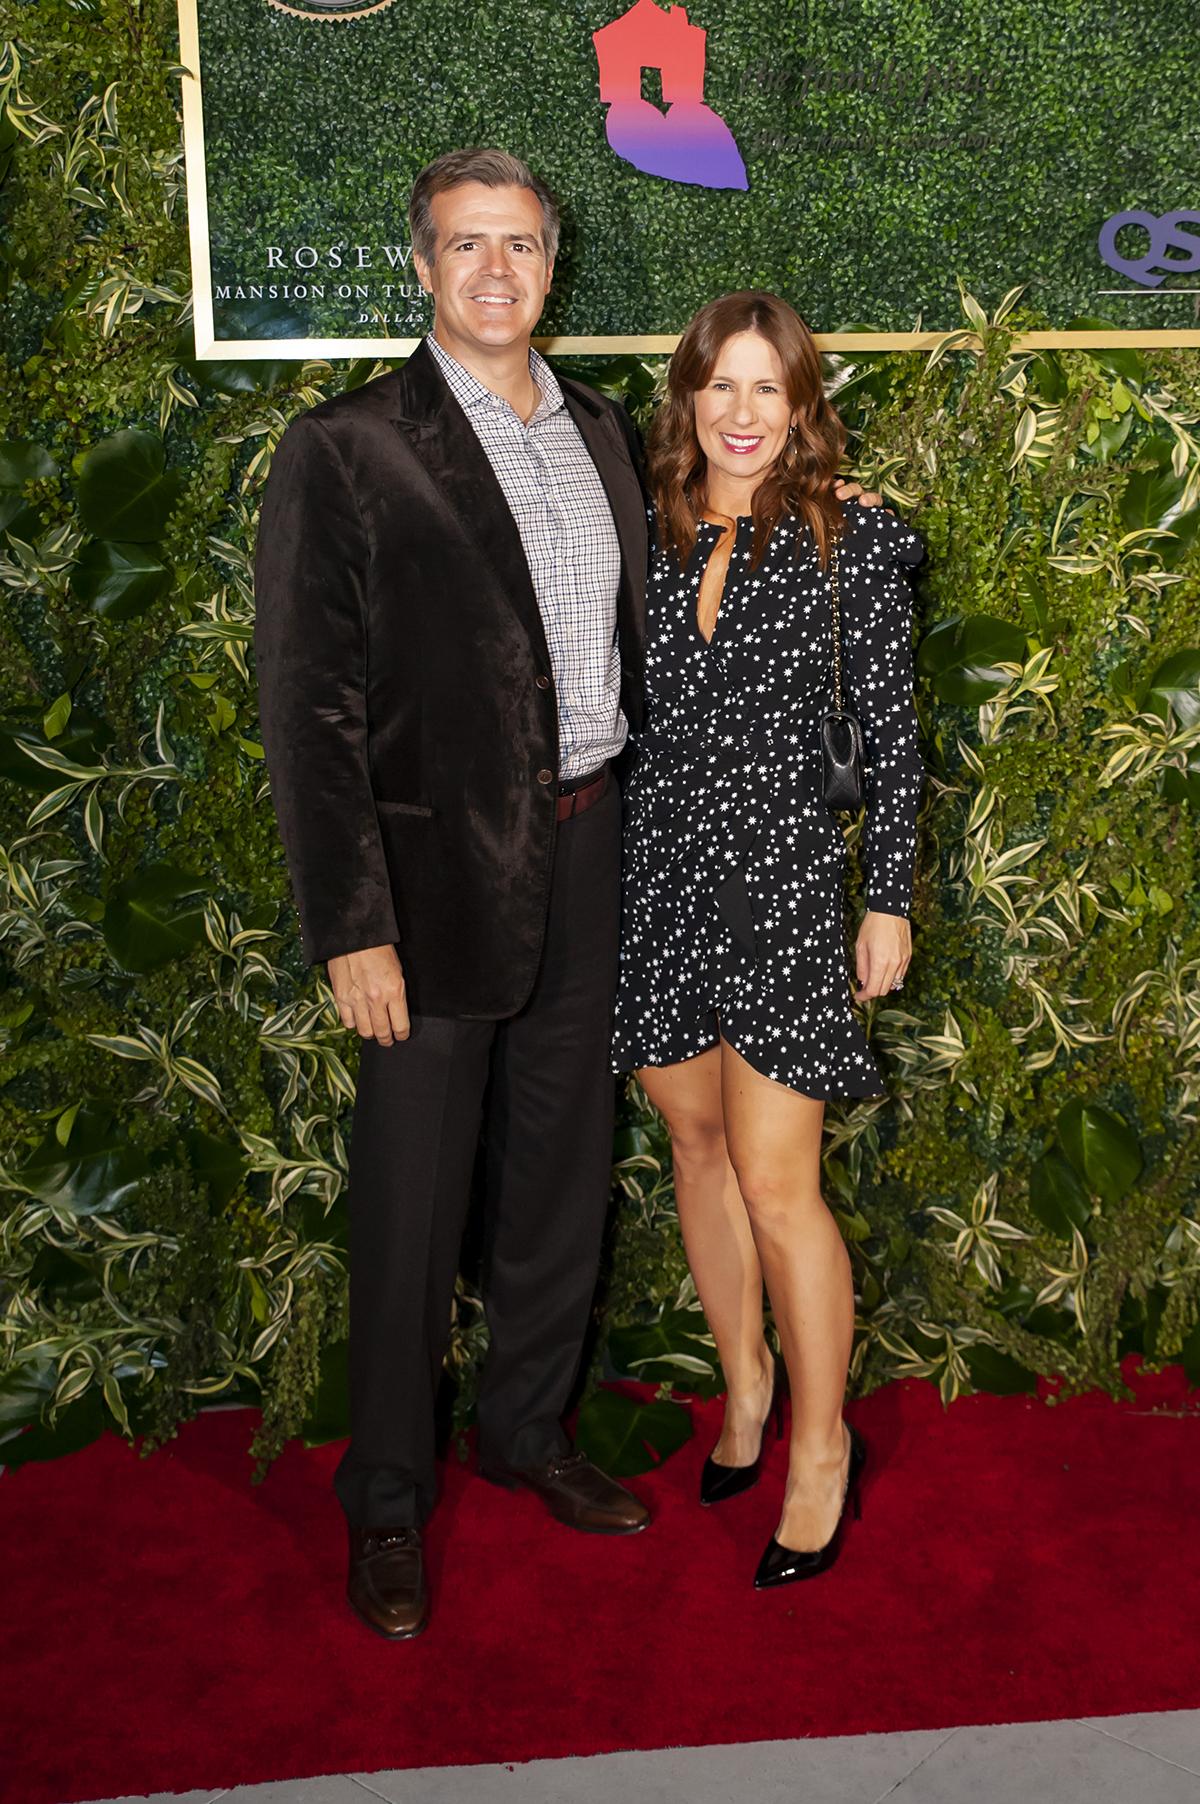 Chuck and Lindsay Jacaman